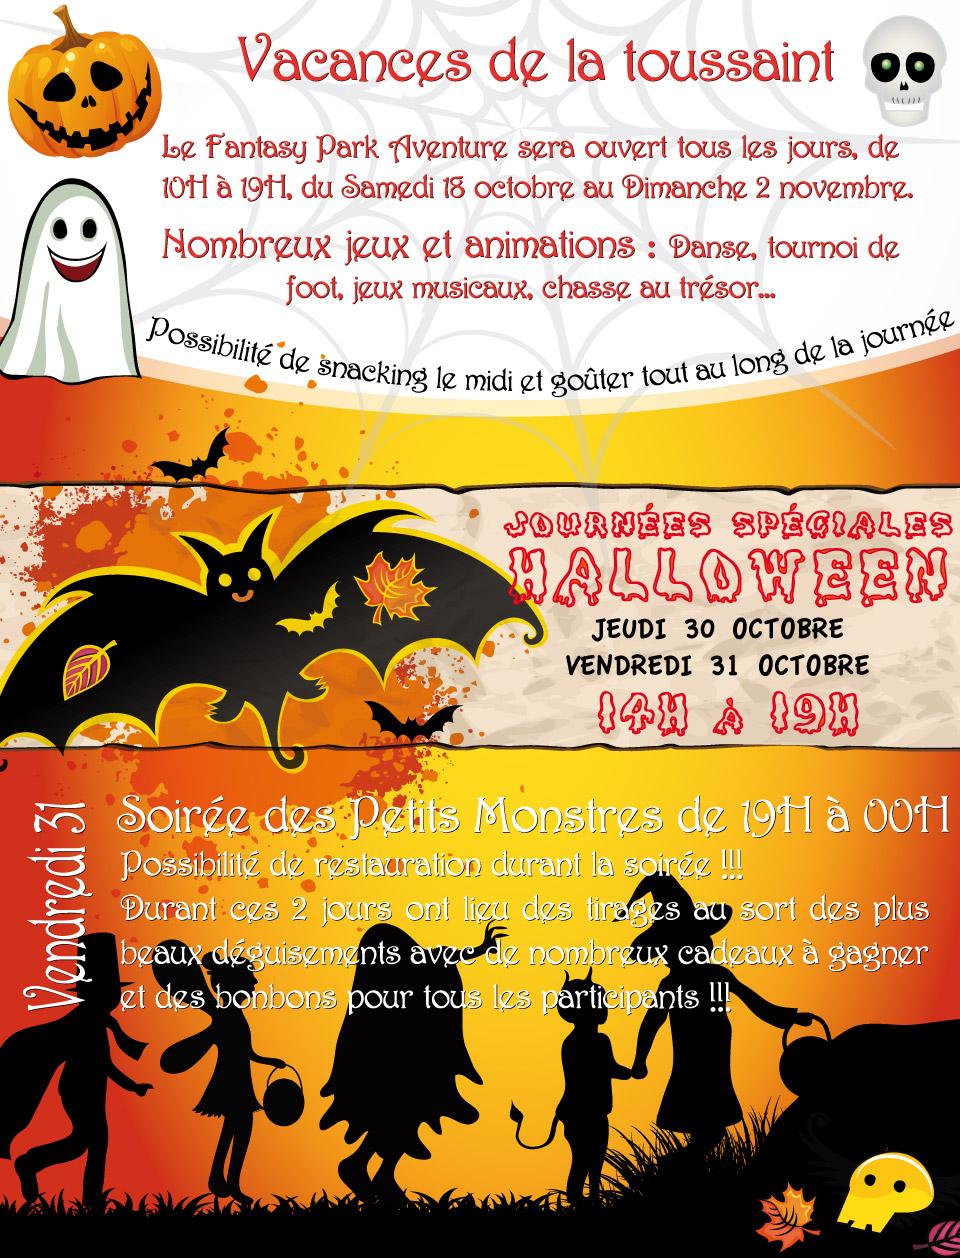 Halloween-FANTASY-PARK-Aventure-2014-960px-v2